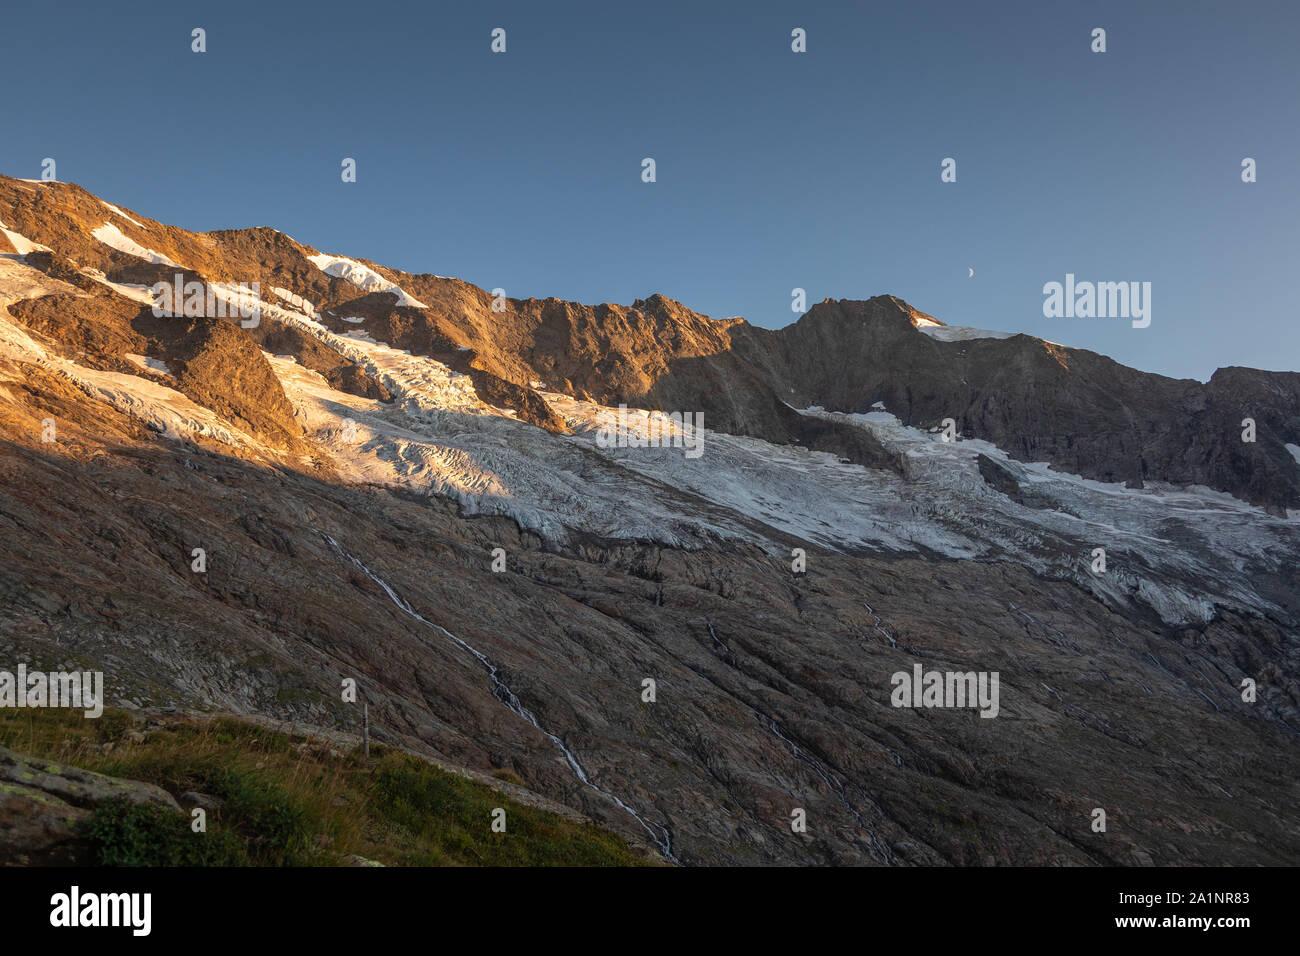 Krimmler Kees glacier. Seracs and crevasses. Sunset sunlight. Krimmler Achen valley. Hohe Tauern National Park. Austrian Alps. Stock Photo